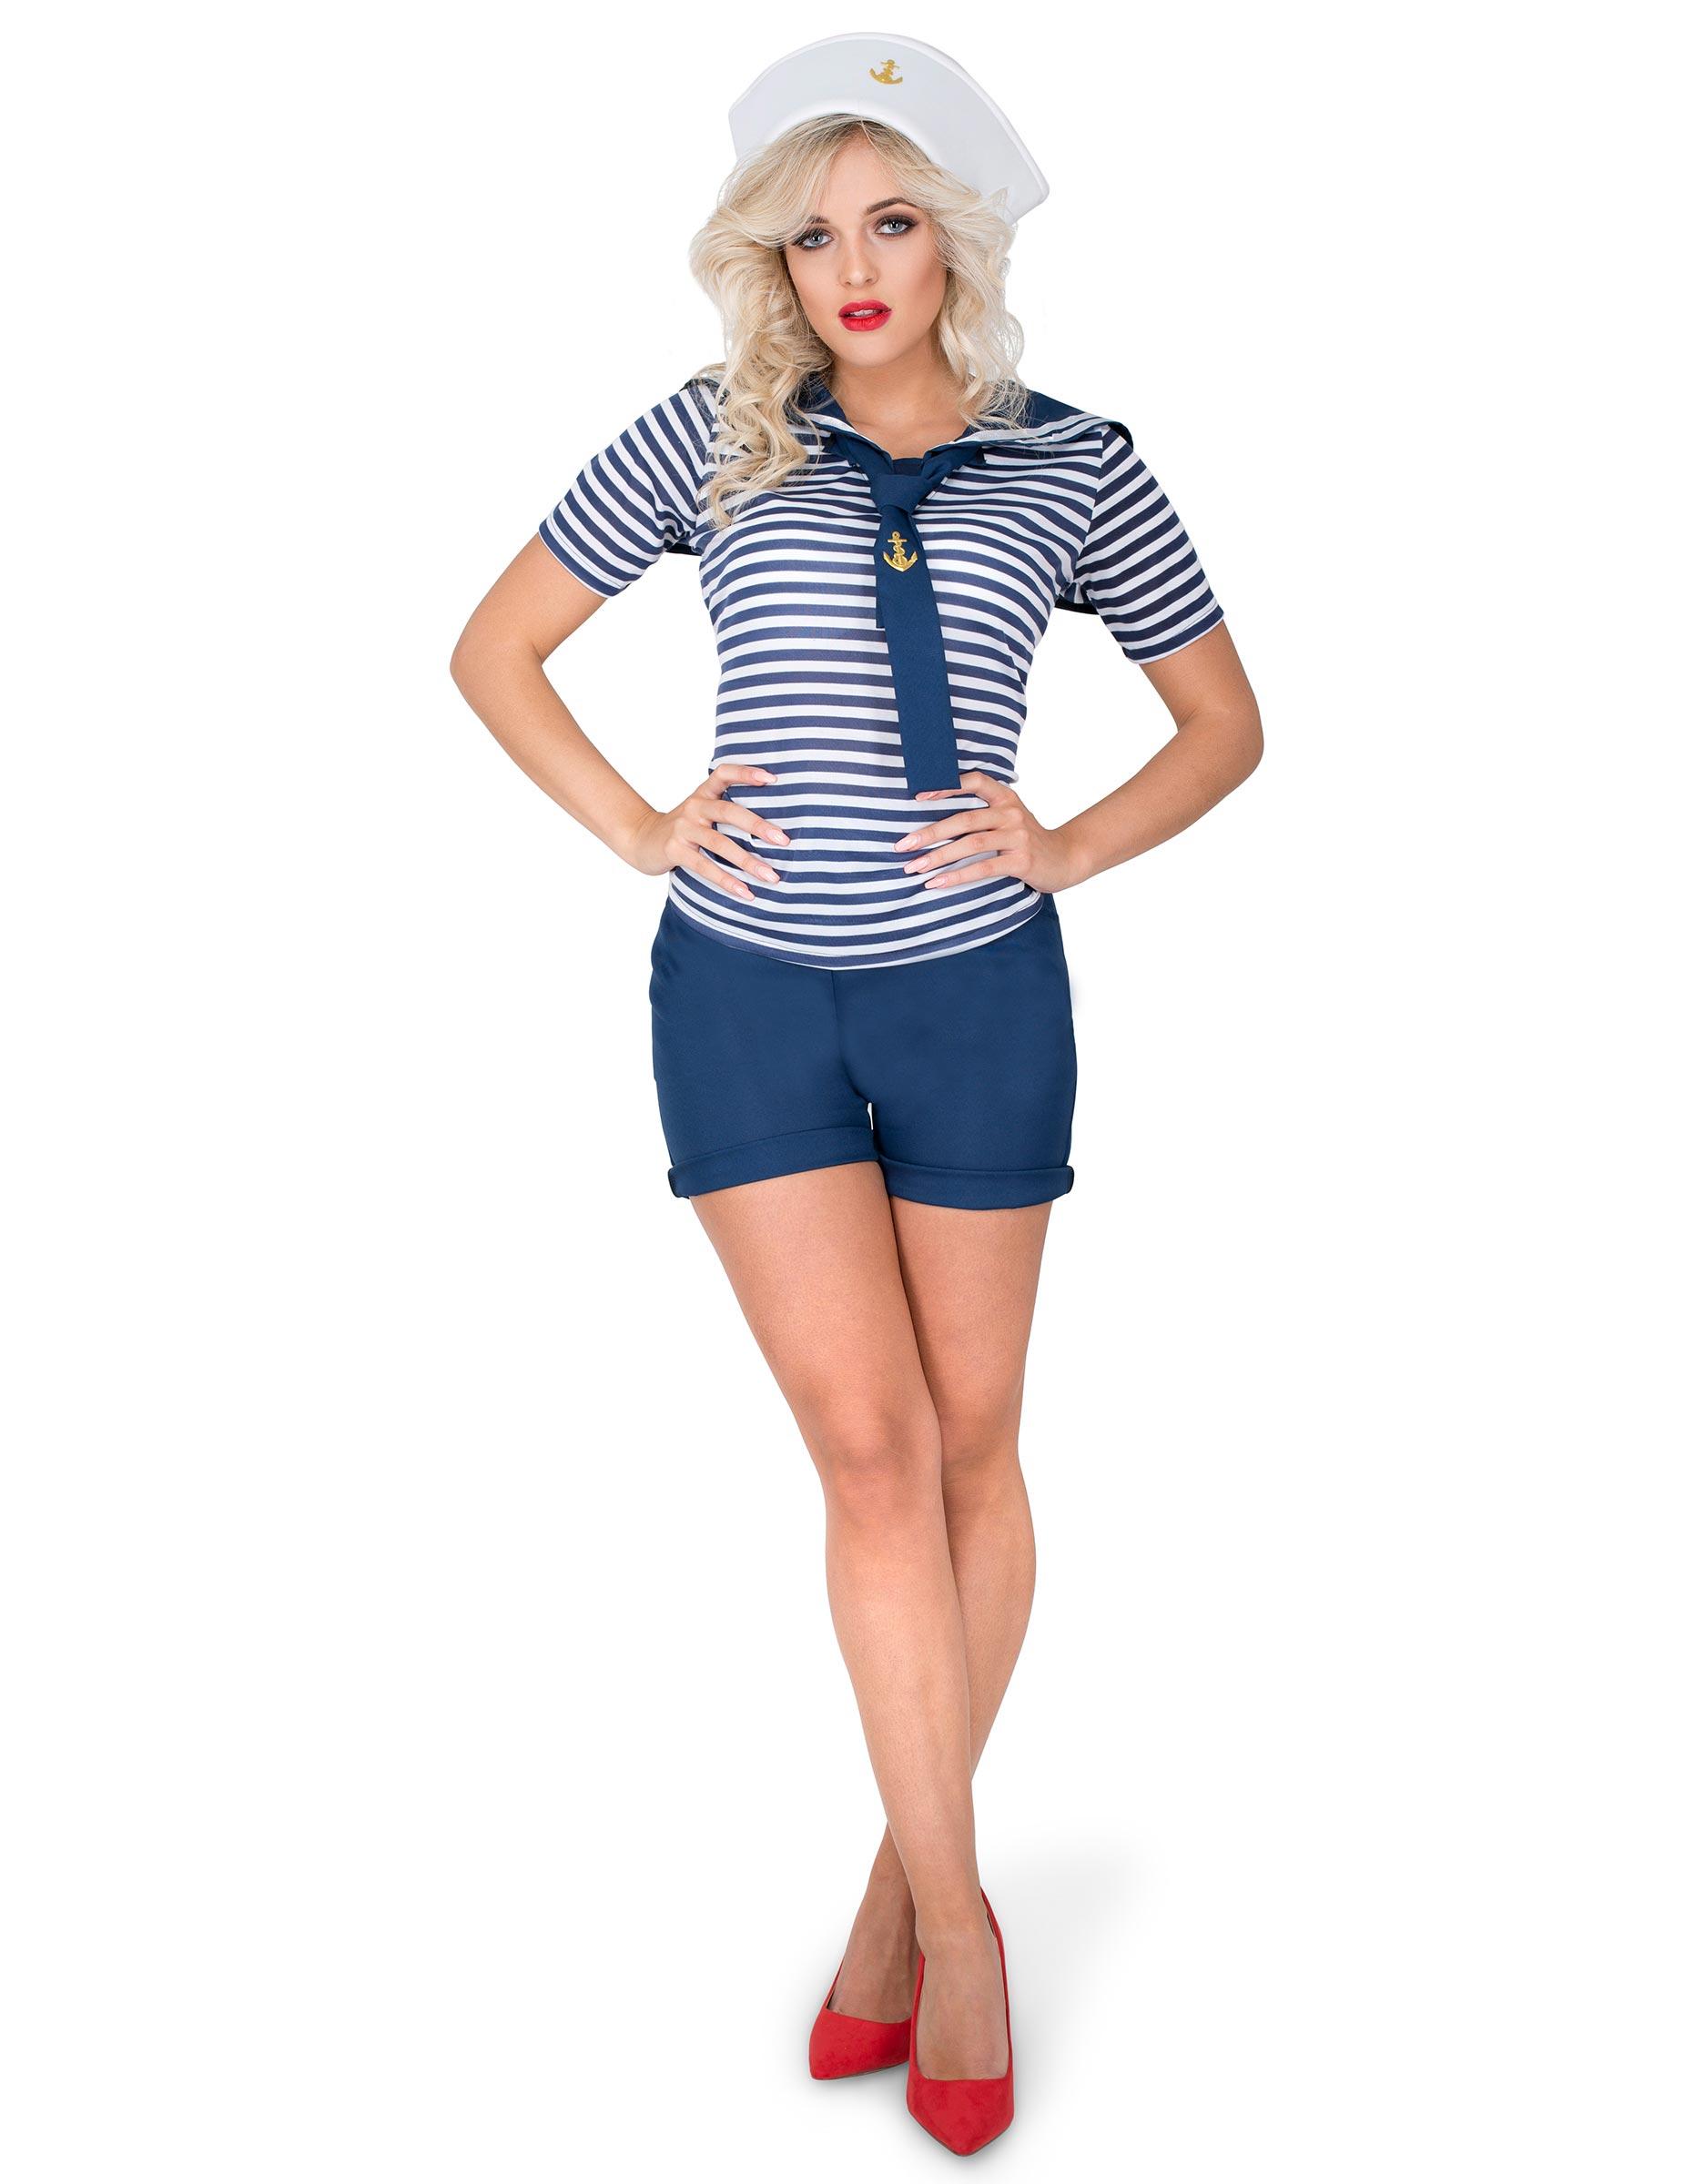 a22d311a4 stunning disfraz de marinera aventurera with como hacer un disfraz de  marinera. finest disfraz bruja premama embarazadas ...